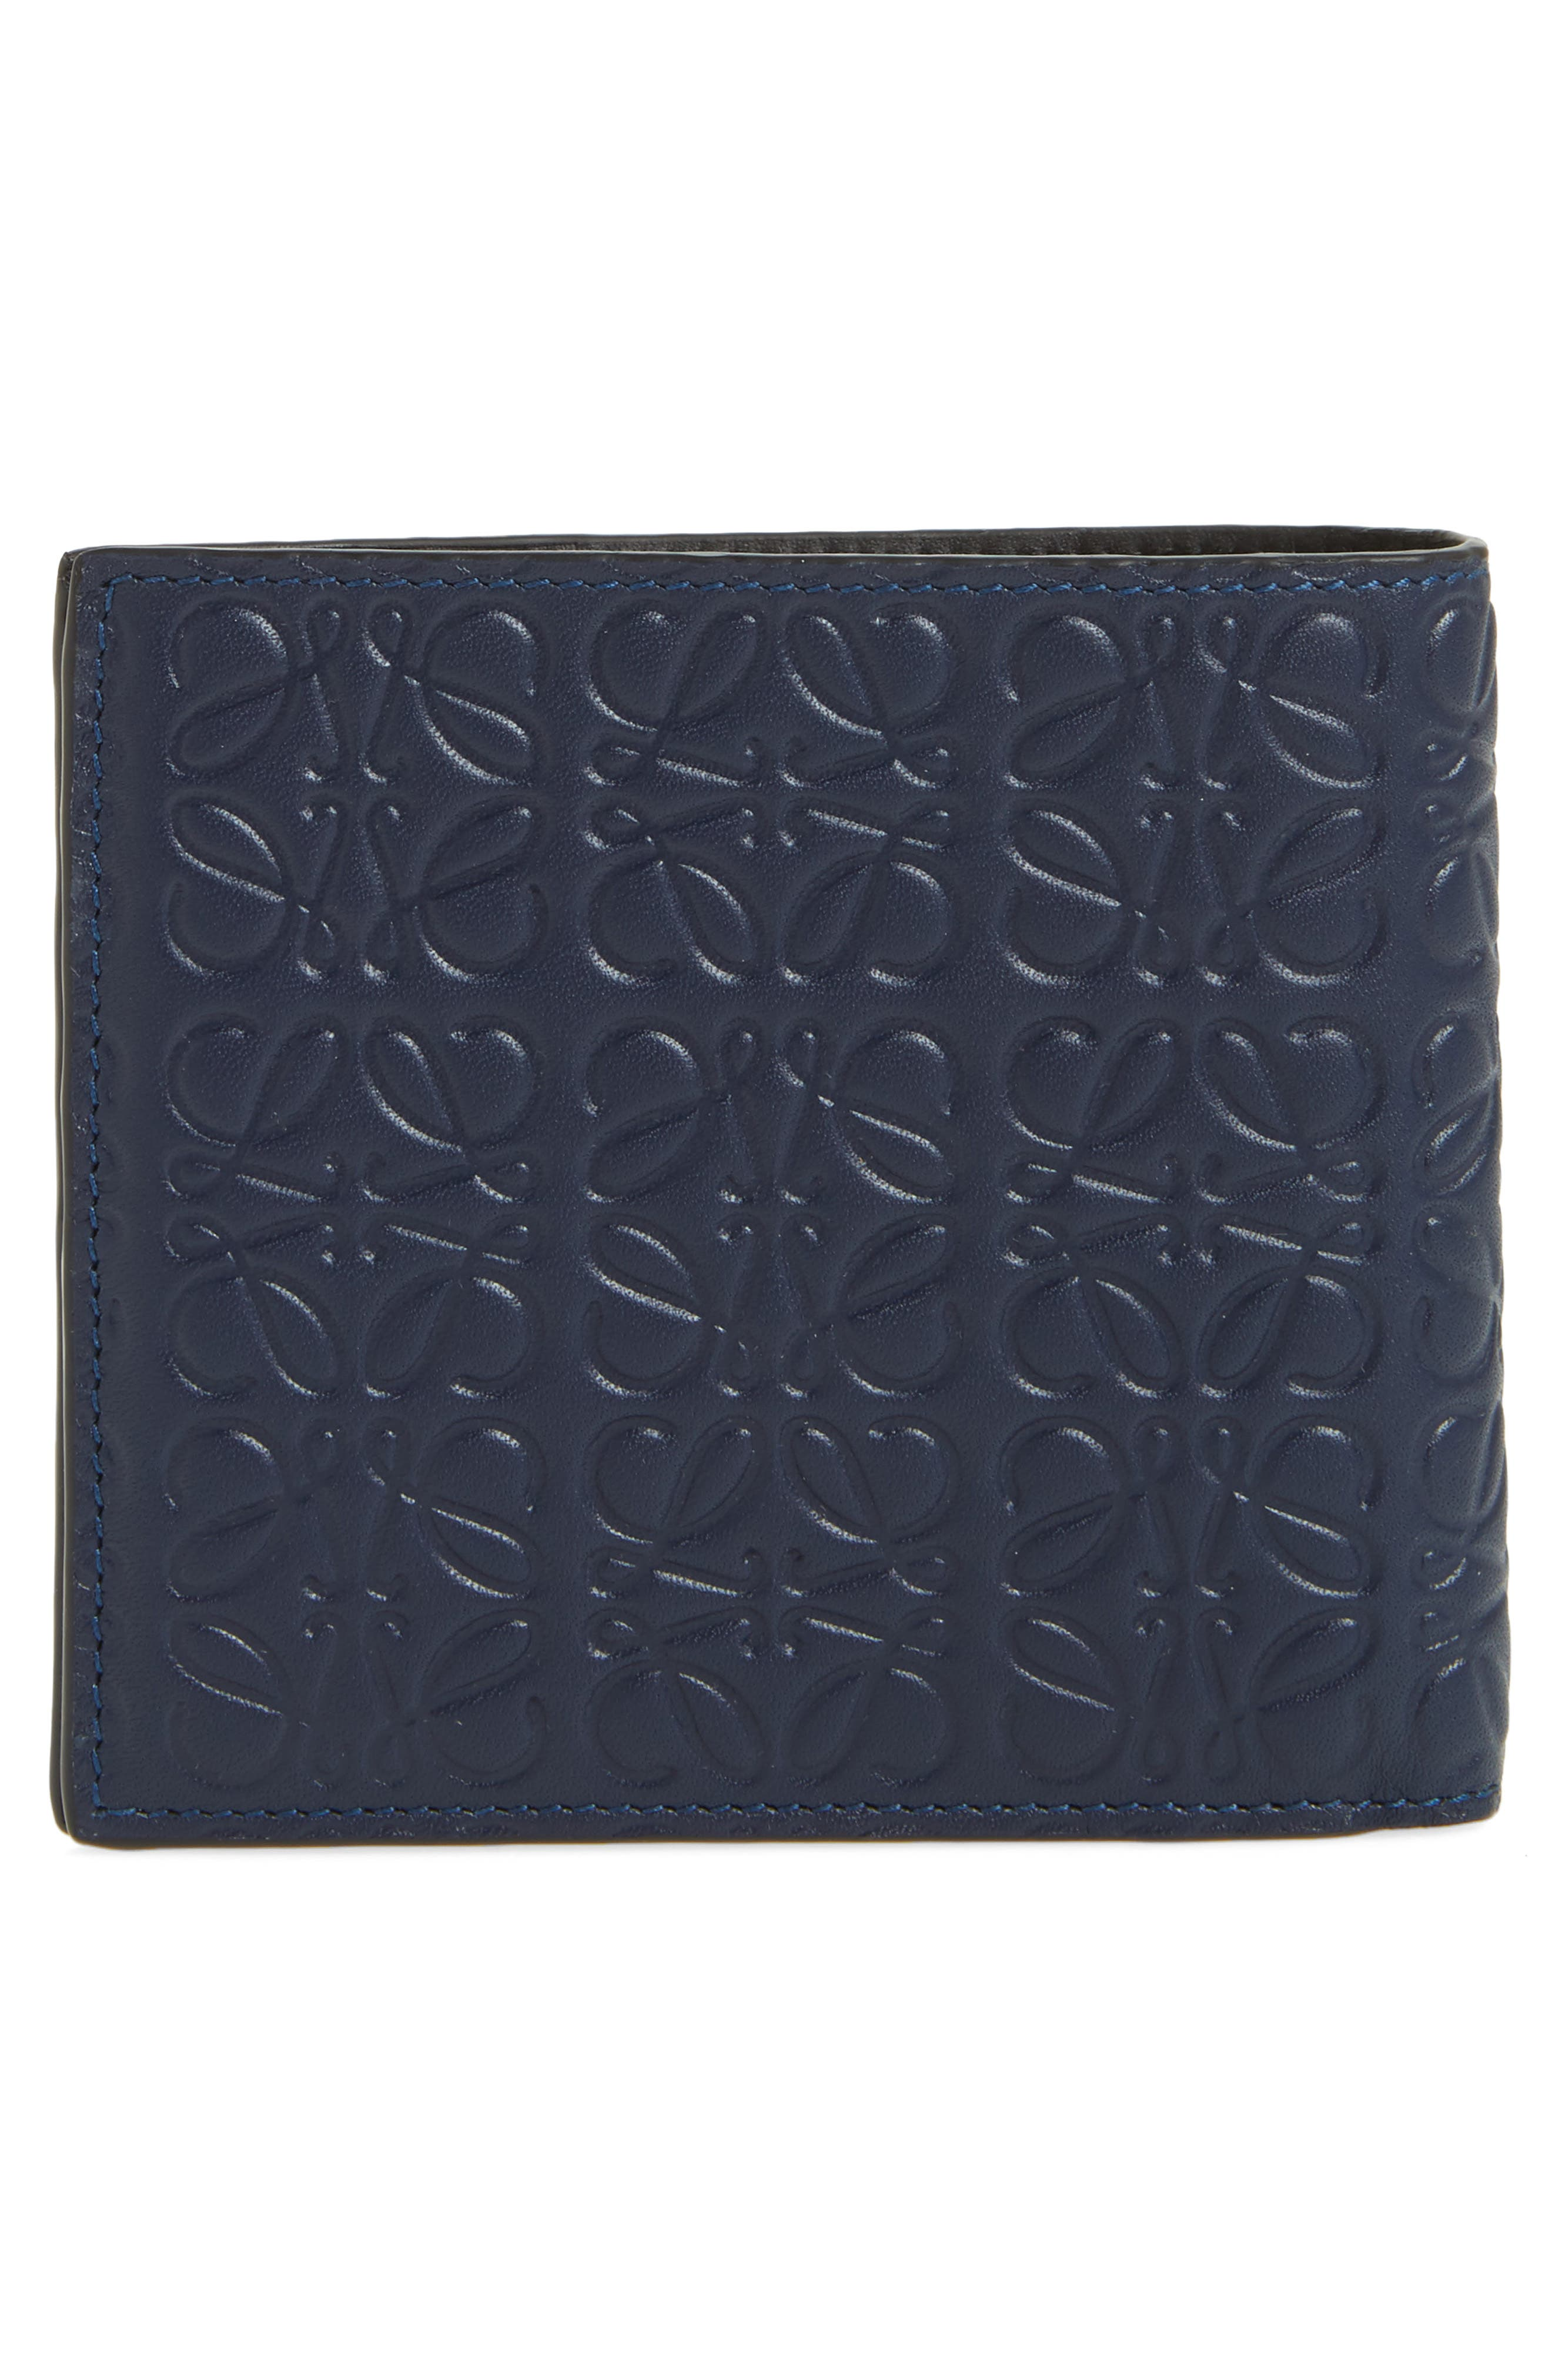 Alternate Image 3  - Loewe Bifold Leather Wallet